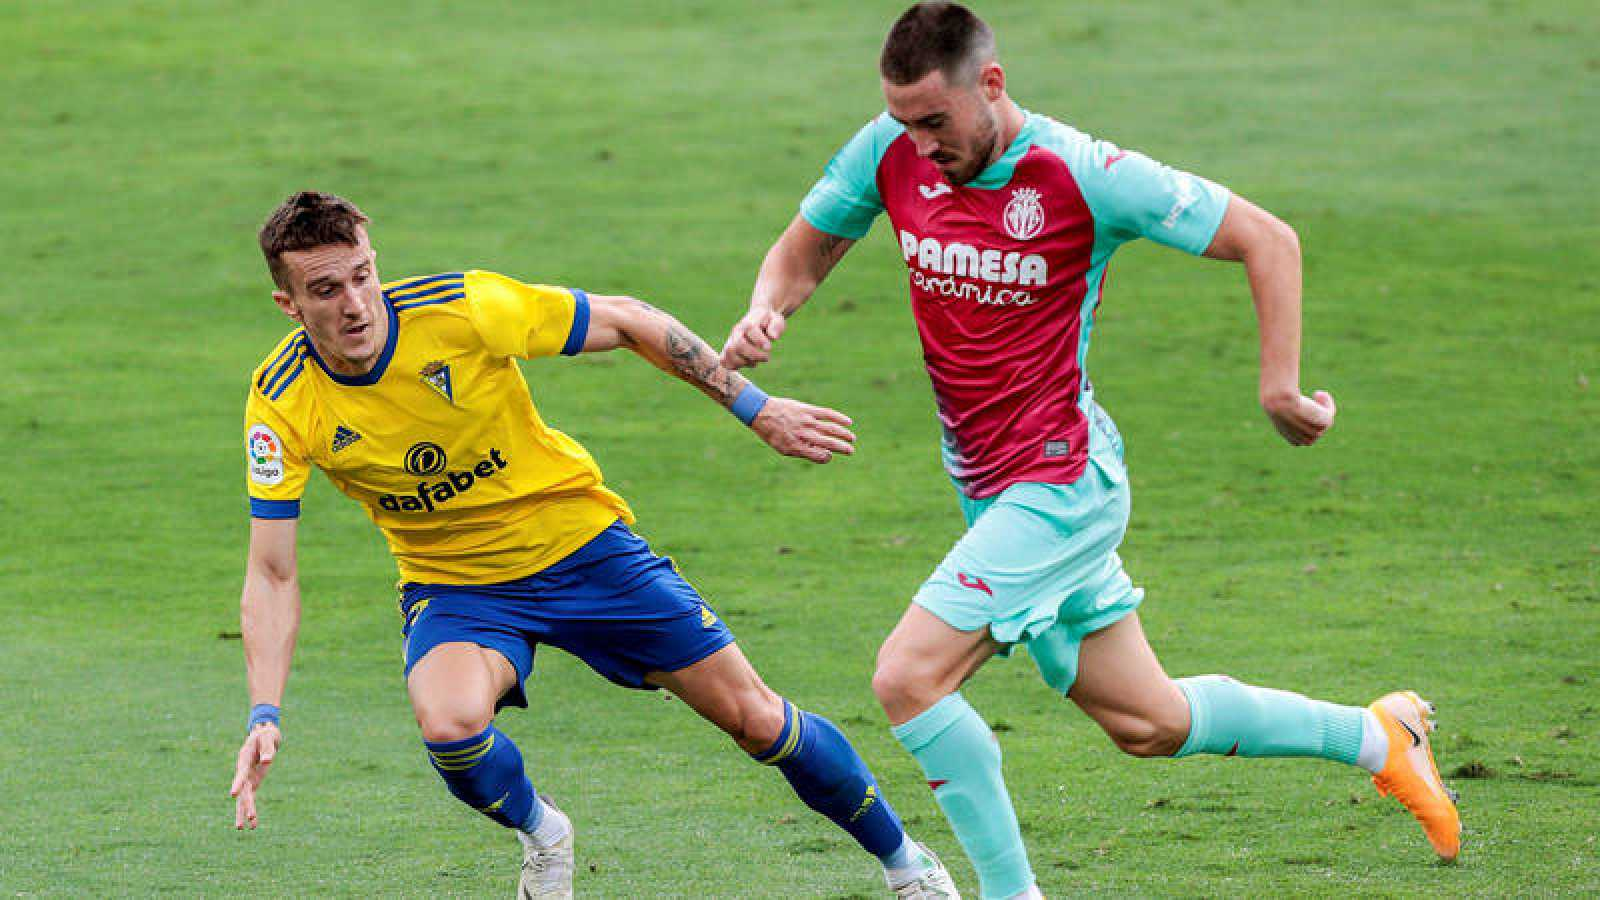 Liga | Villarreal y Cádiz empatan sin goles